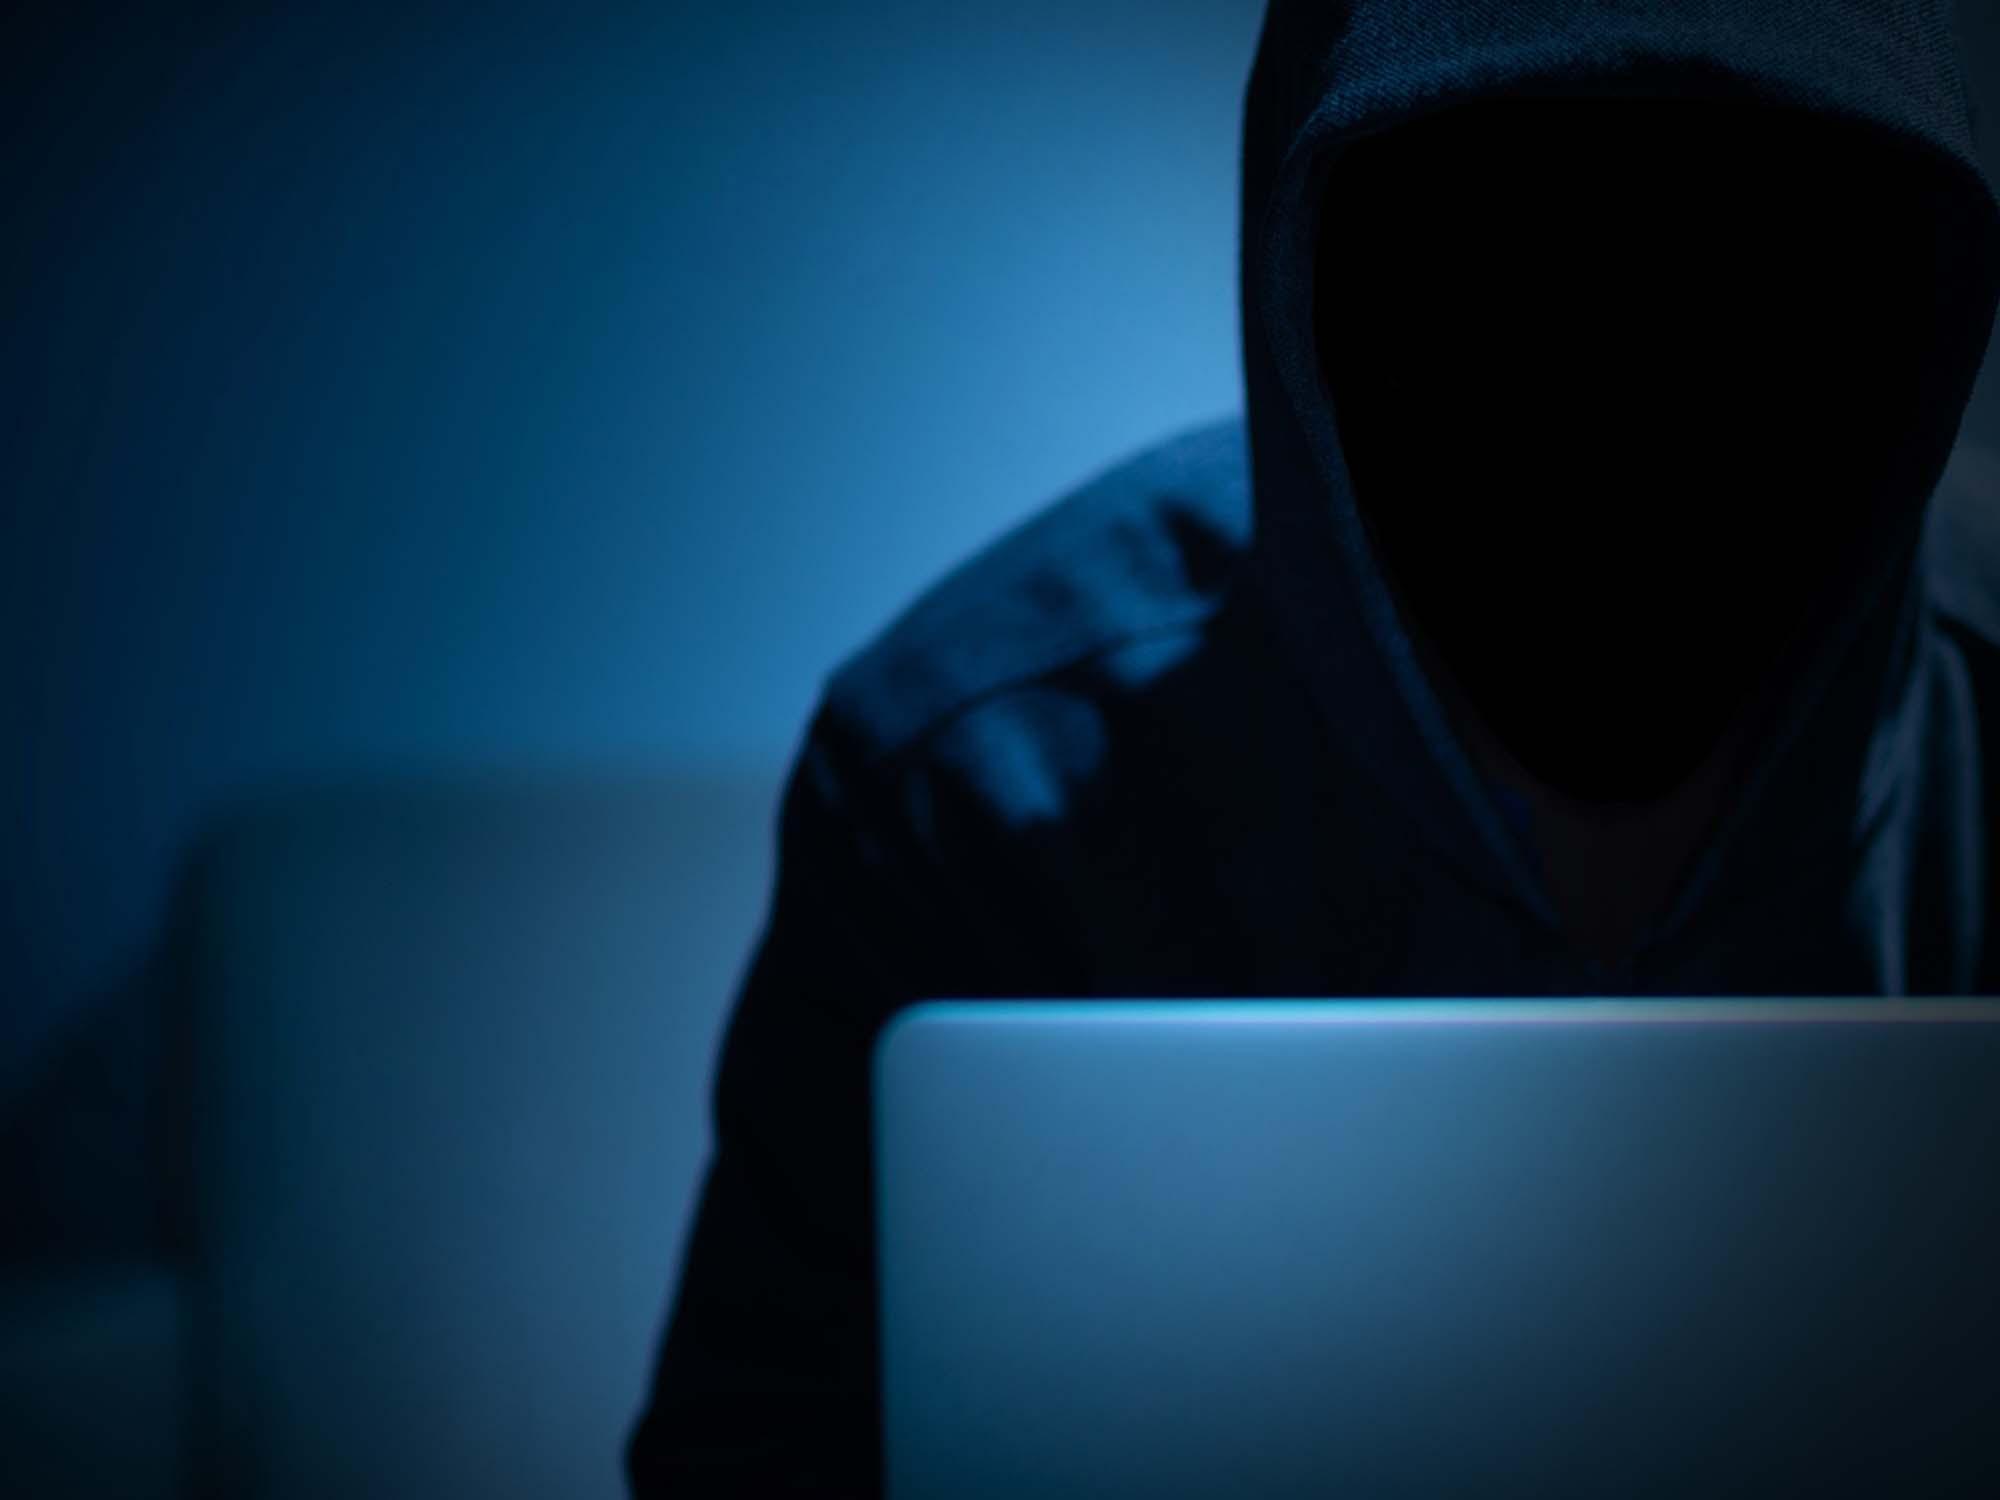 Hackers attack victim twice